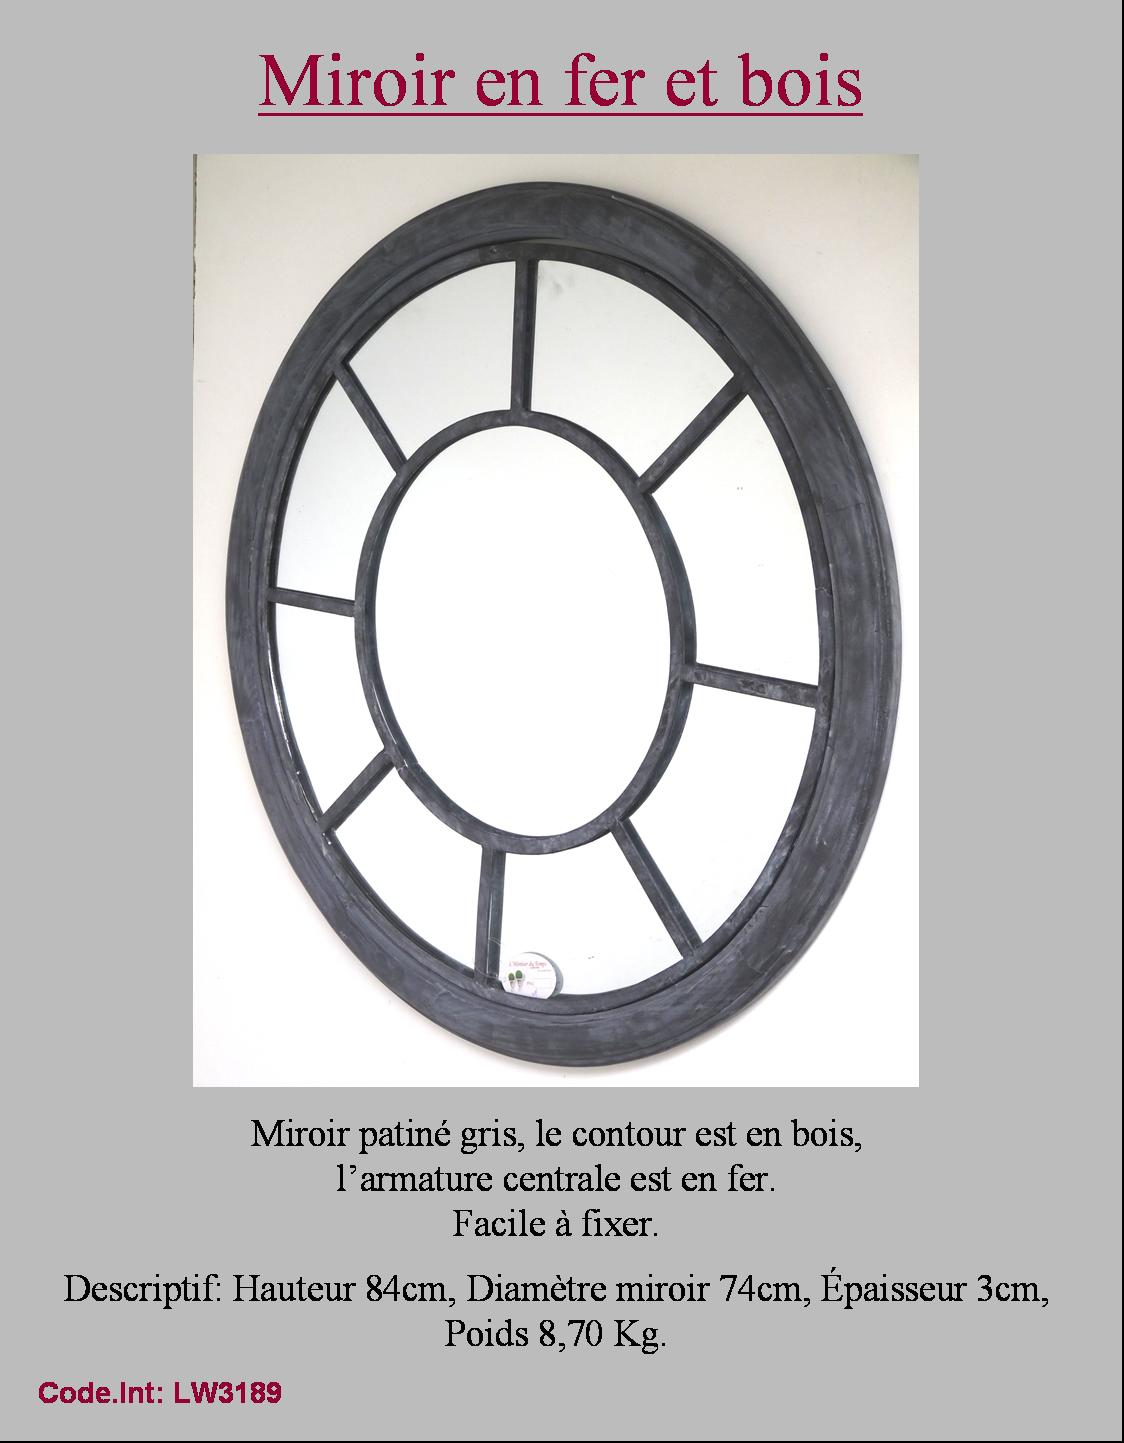 Miroir mural oeil de boeuf hublot rond en fer murale ebay for Miroir oeil de boeuf